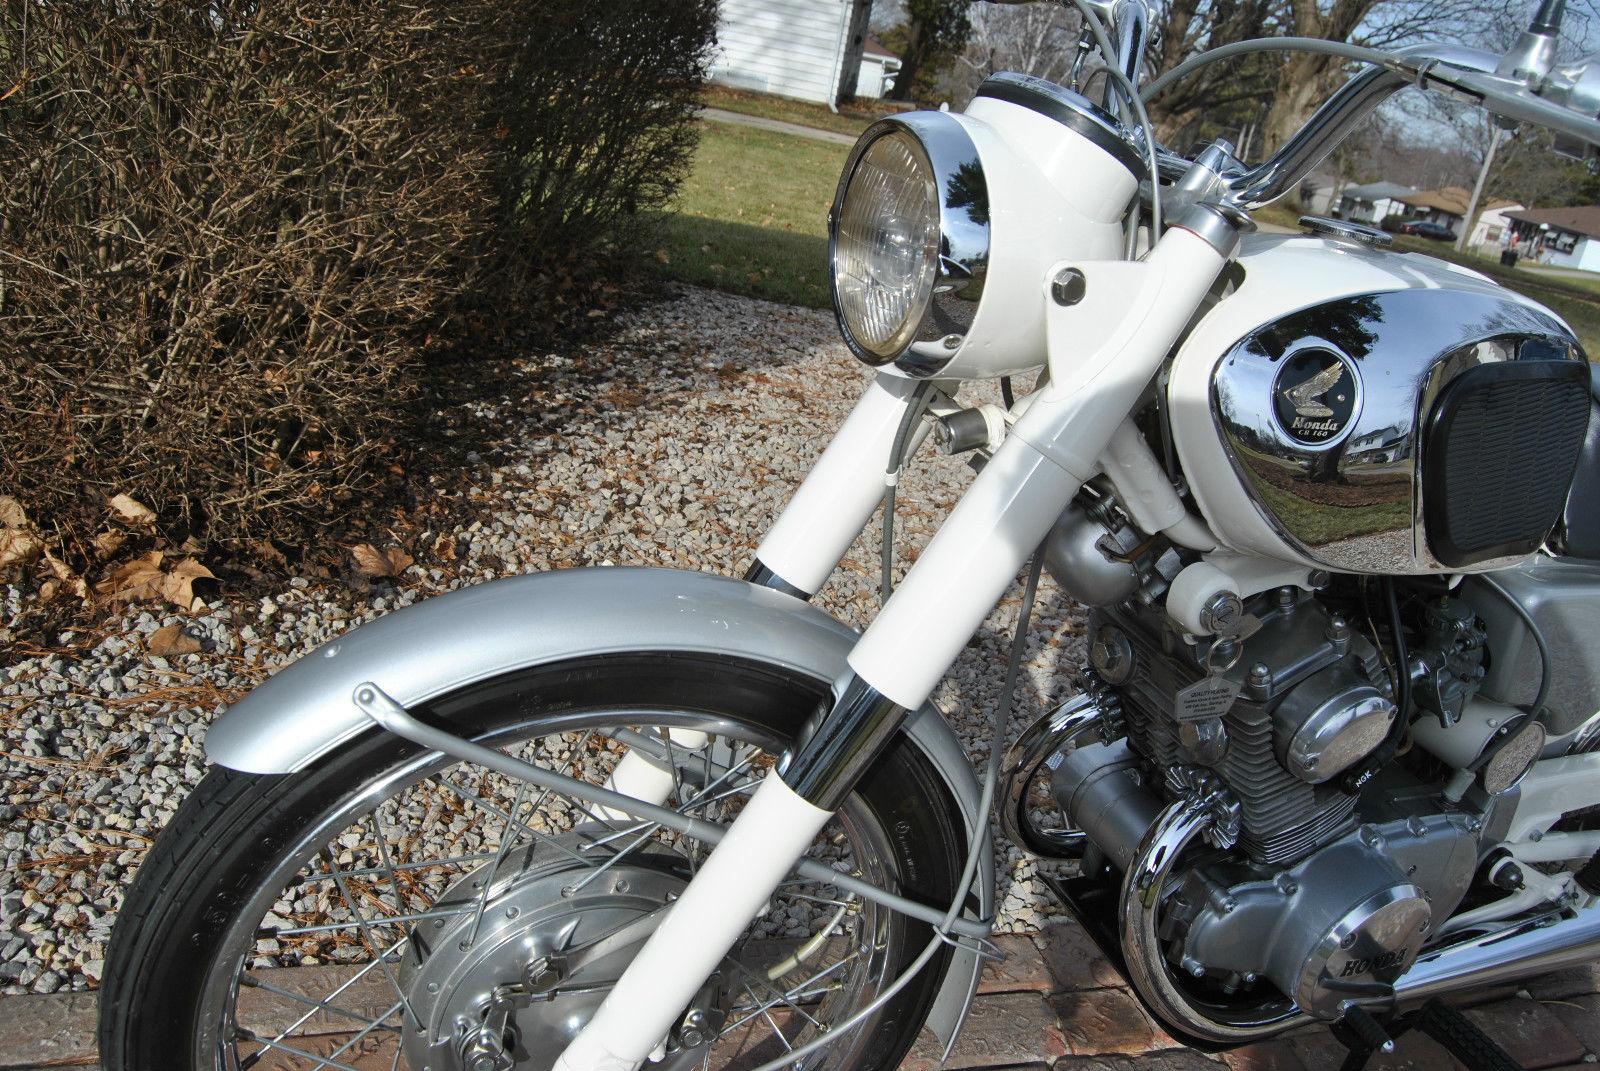 Honda CB160 Sport - 1969 - Forks, Headlight, Front Wheel and Mudguard.